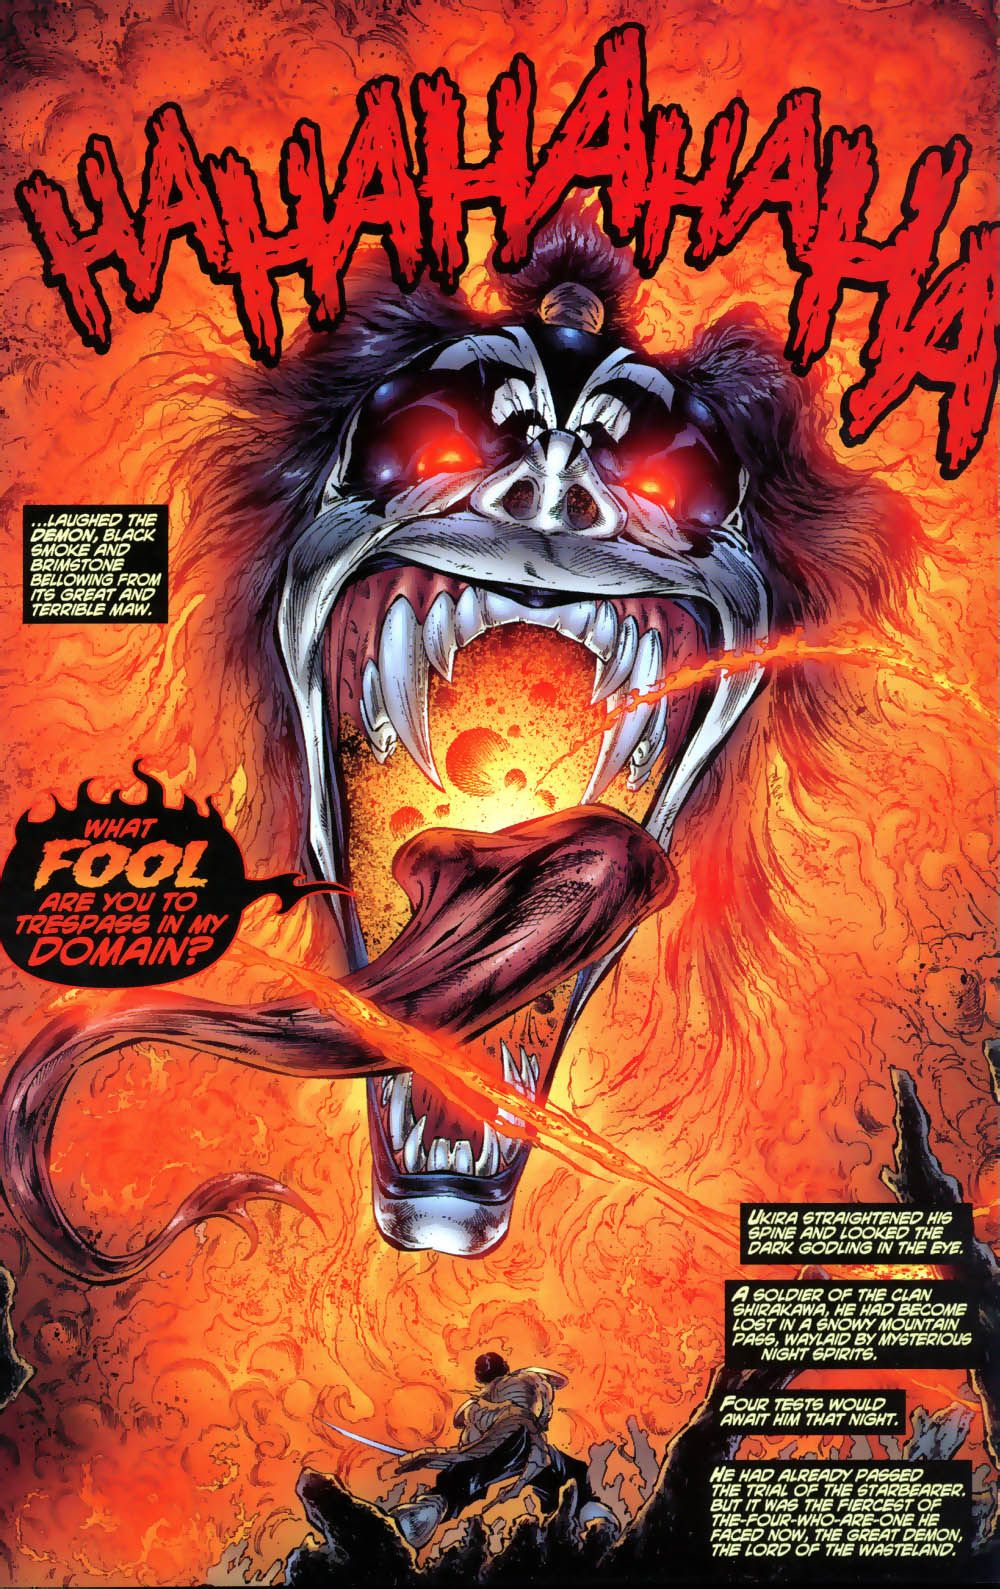 Kiss Gene Simmons The Demon Solo Album Cover Adult T Shirt Heavy Metal Music